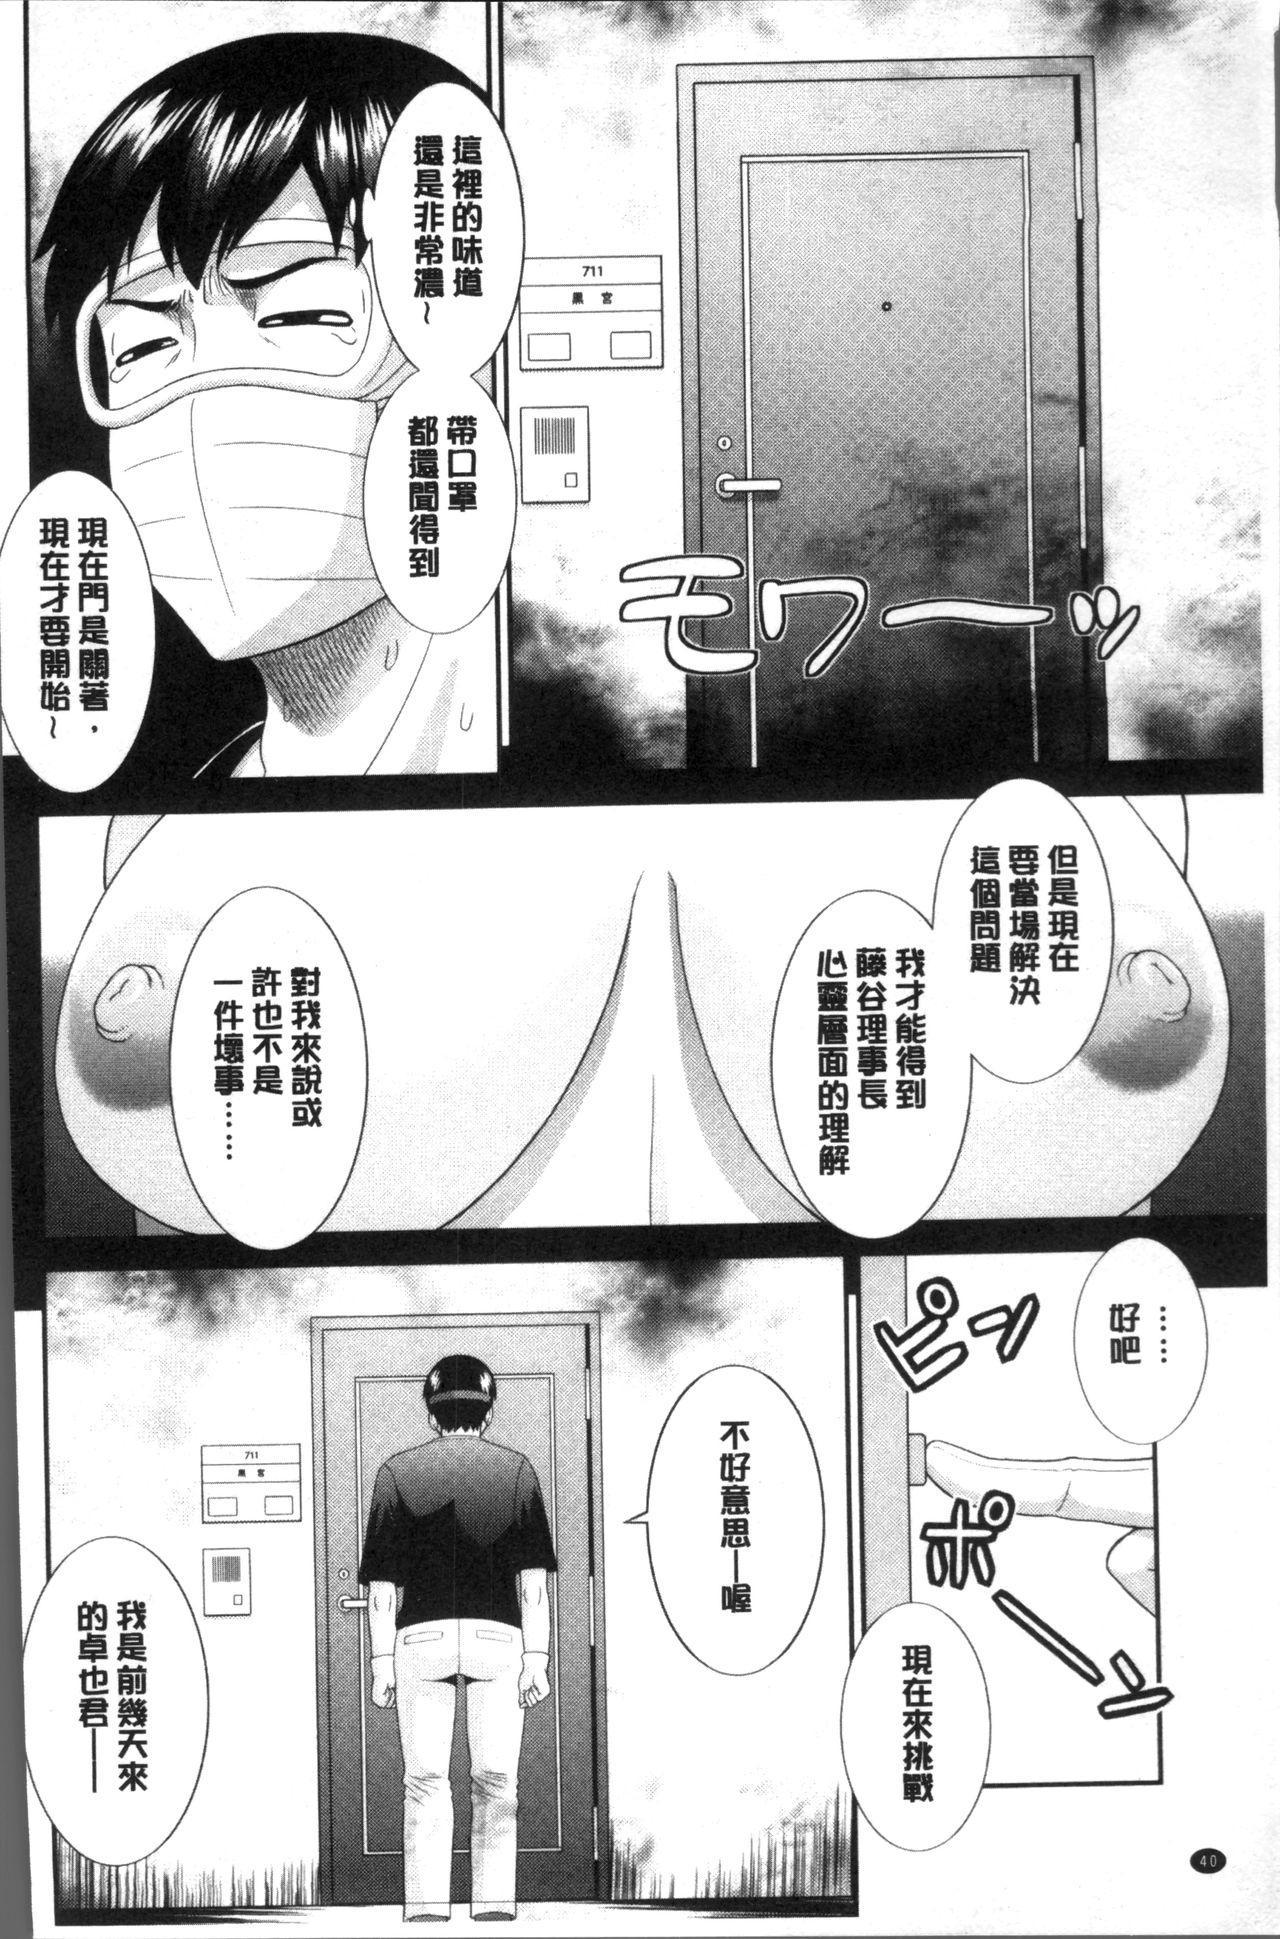 [Kawamori Misaki] Innyuu Shufu no Futei Ganbou - Oku-san to Kanojo to 2 | 淫乳主婦的不貞願望 和人妻也和女友❤2 [Chinese] 43